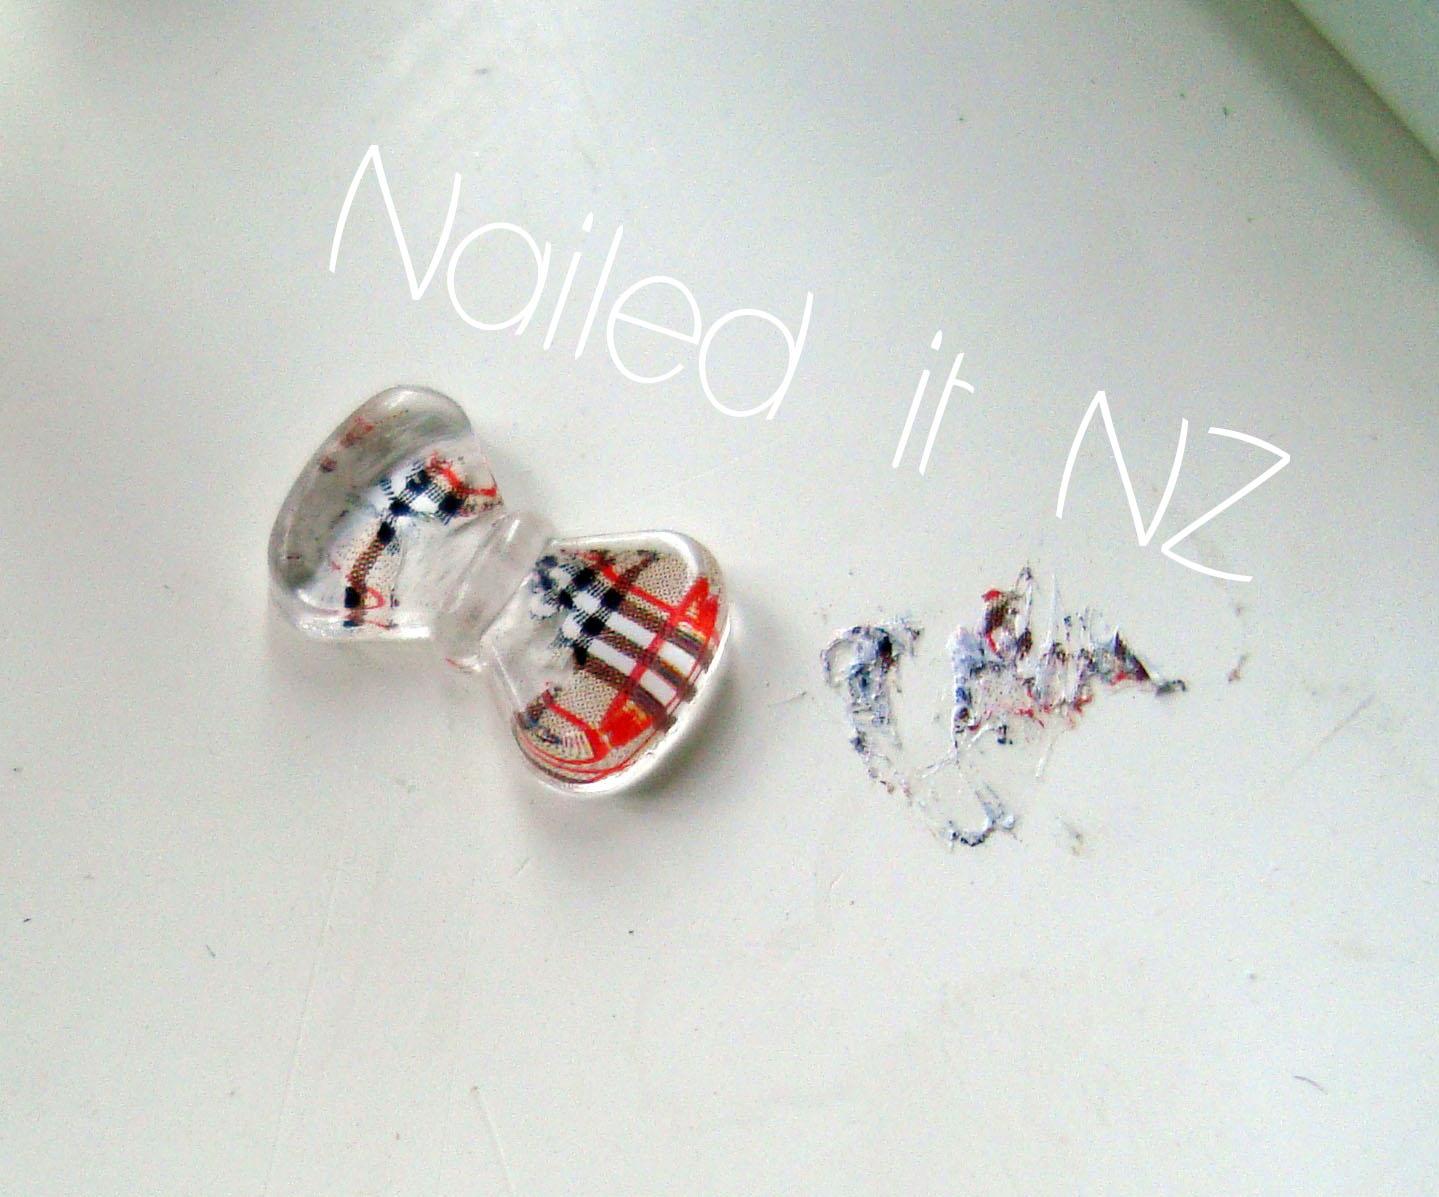 Burburry/Plaid Nail Art - With 3D Bows From KKcenterhk